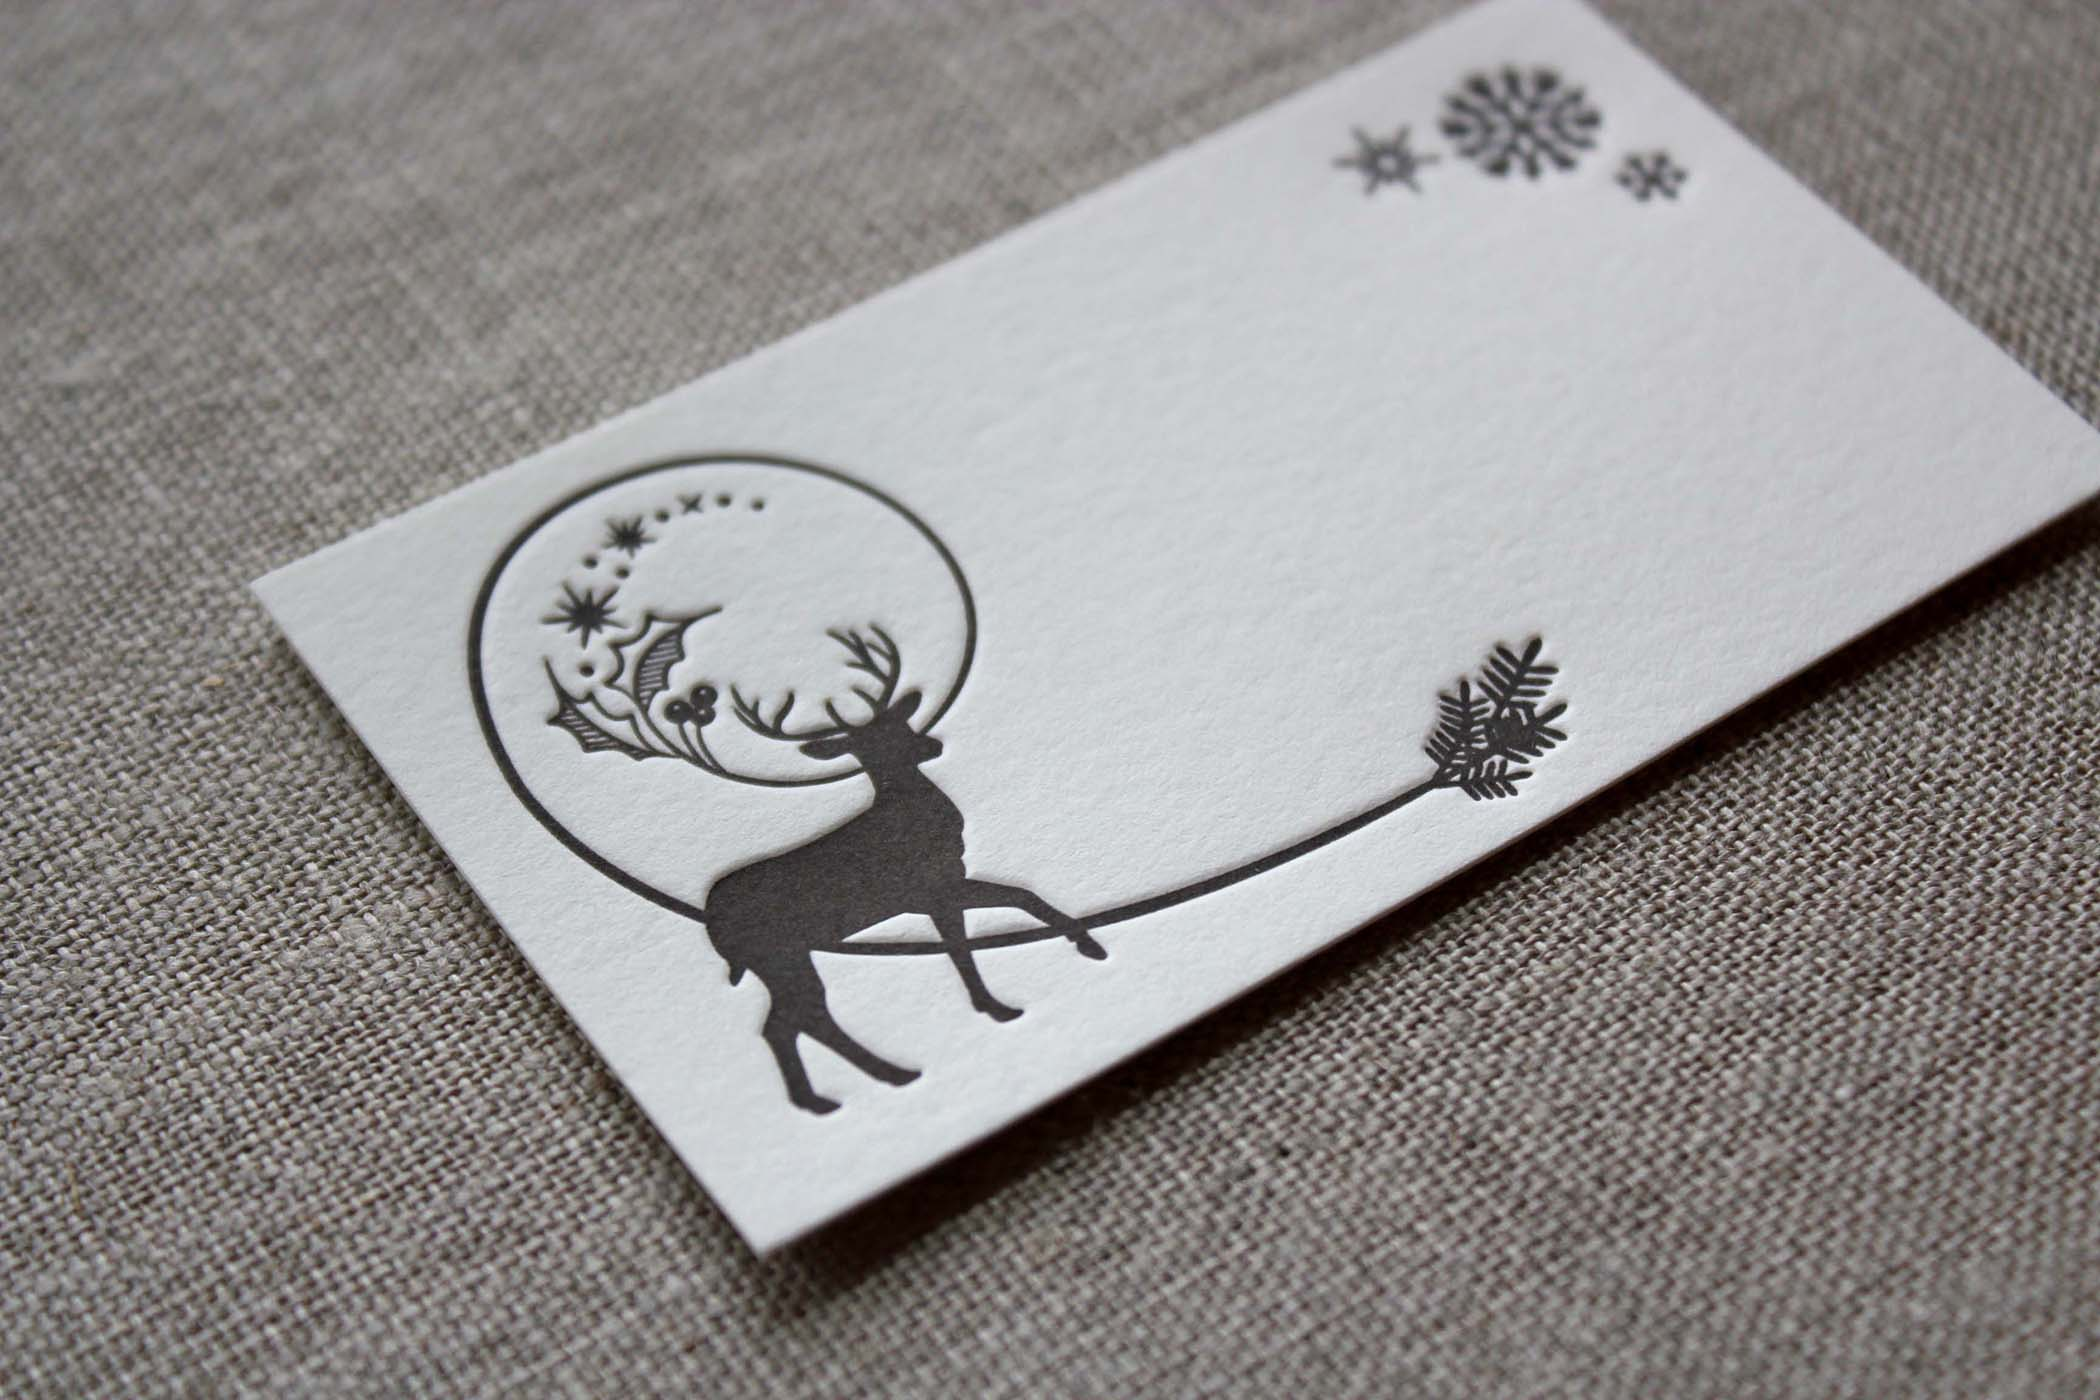 Winter Deer Letterpressed Holiday Gift Tags